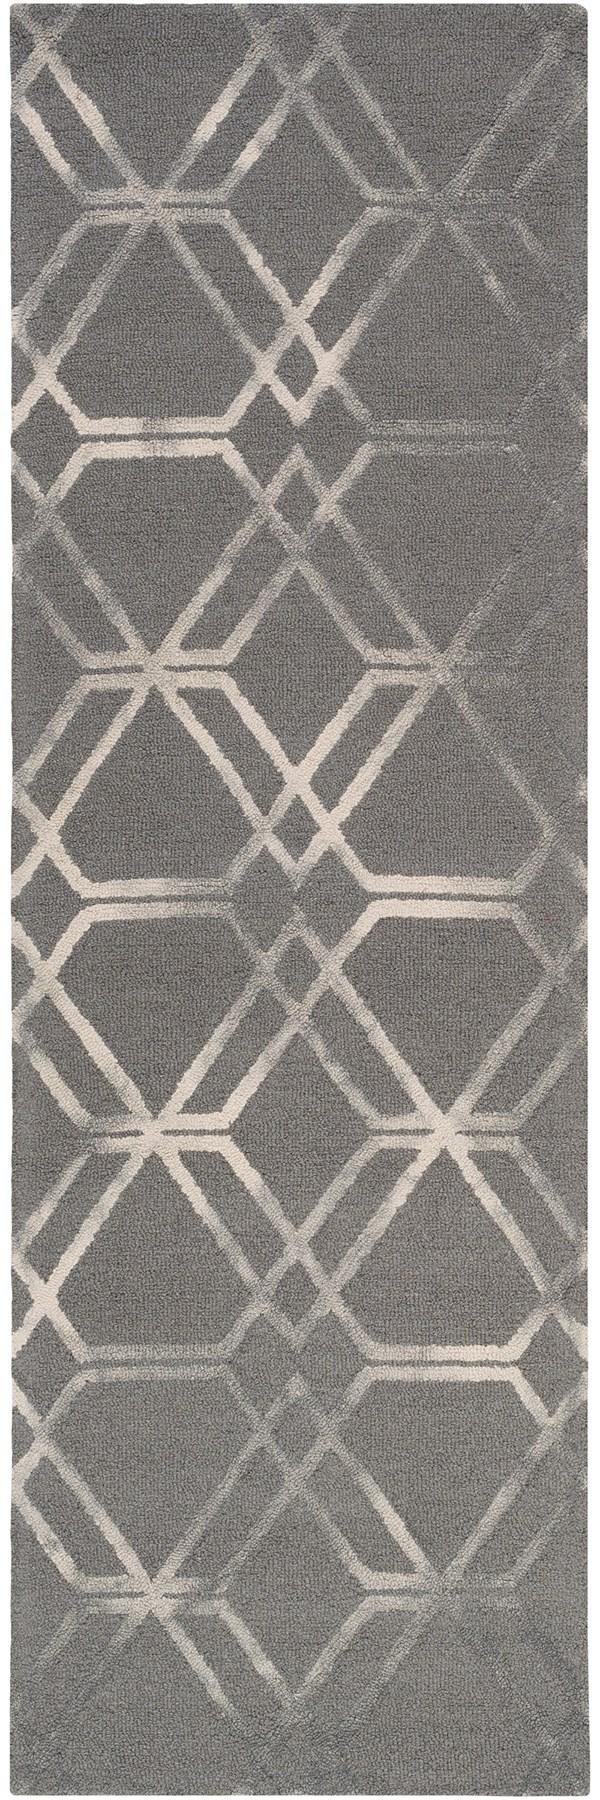 Medium Gray, Cream, Charcoal Transitional Area Rug